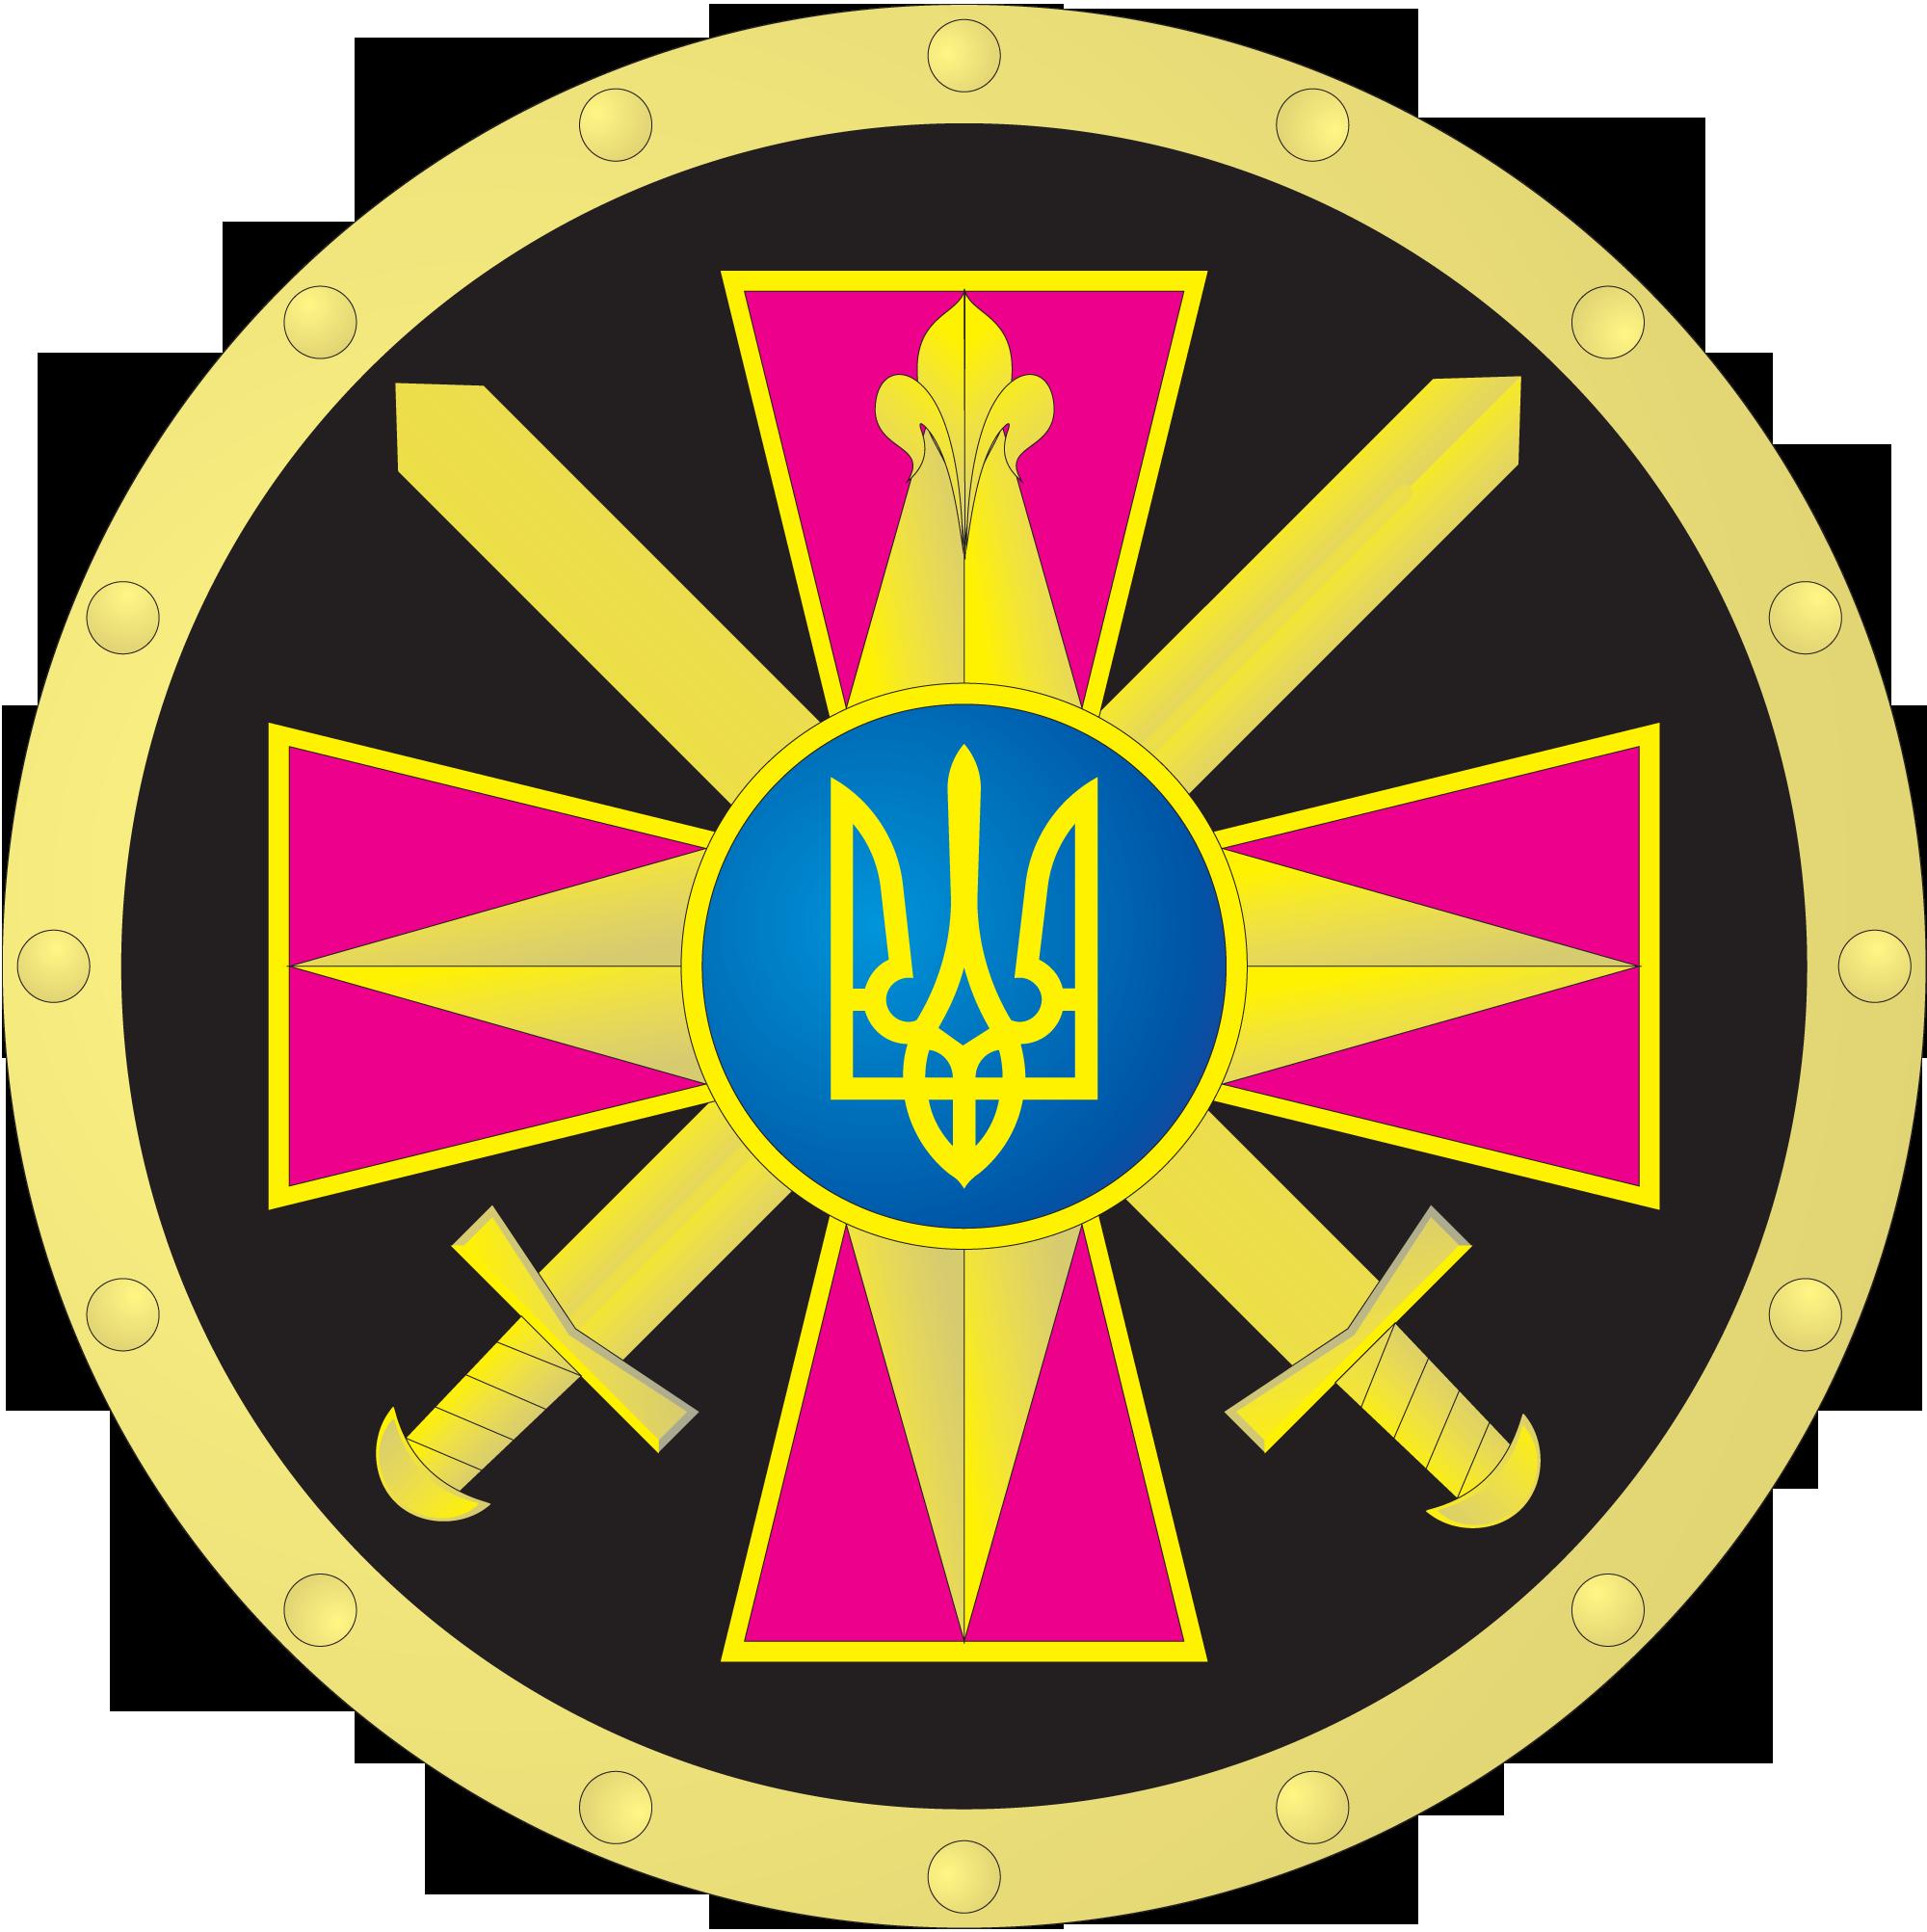 ГУР Минобороны Украины